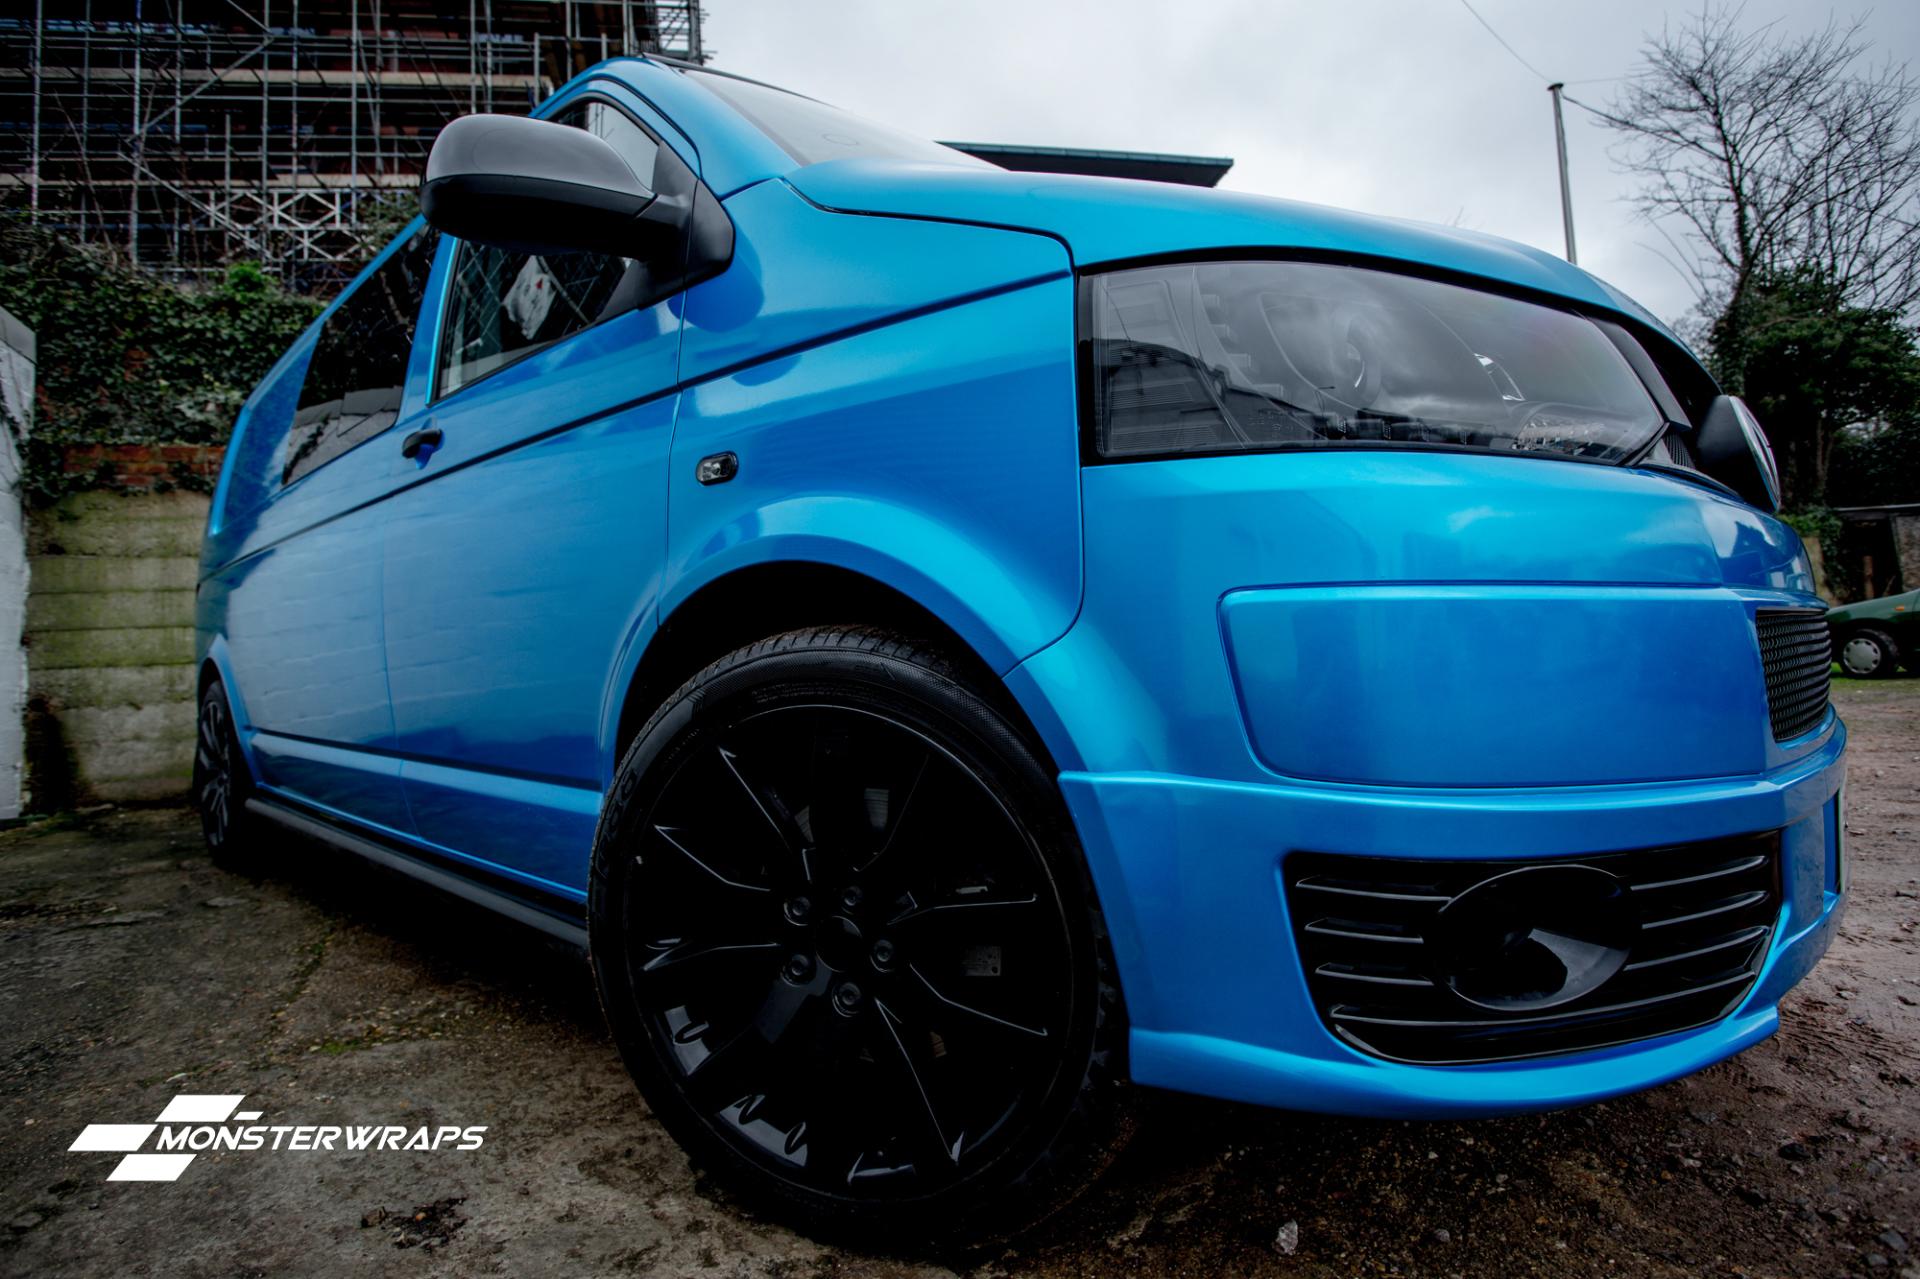 VW Transporter T5 Gloss atlantis blue wrap